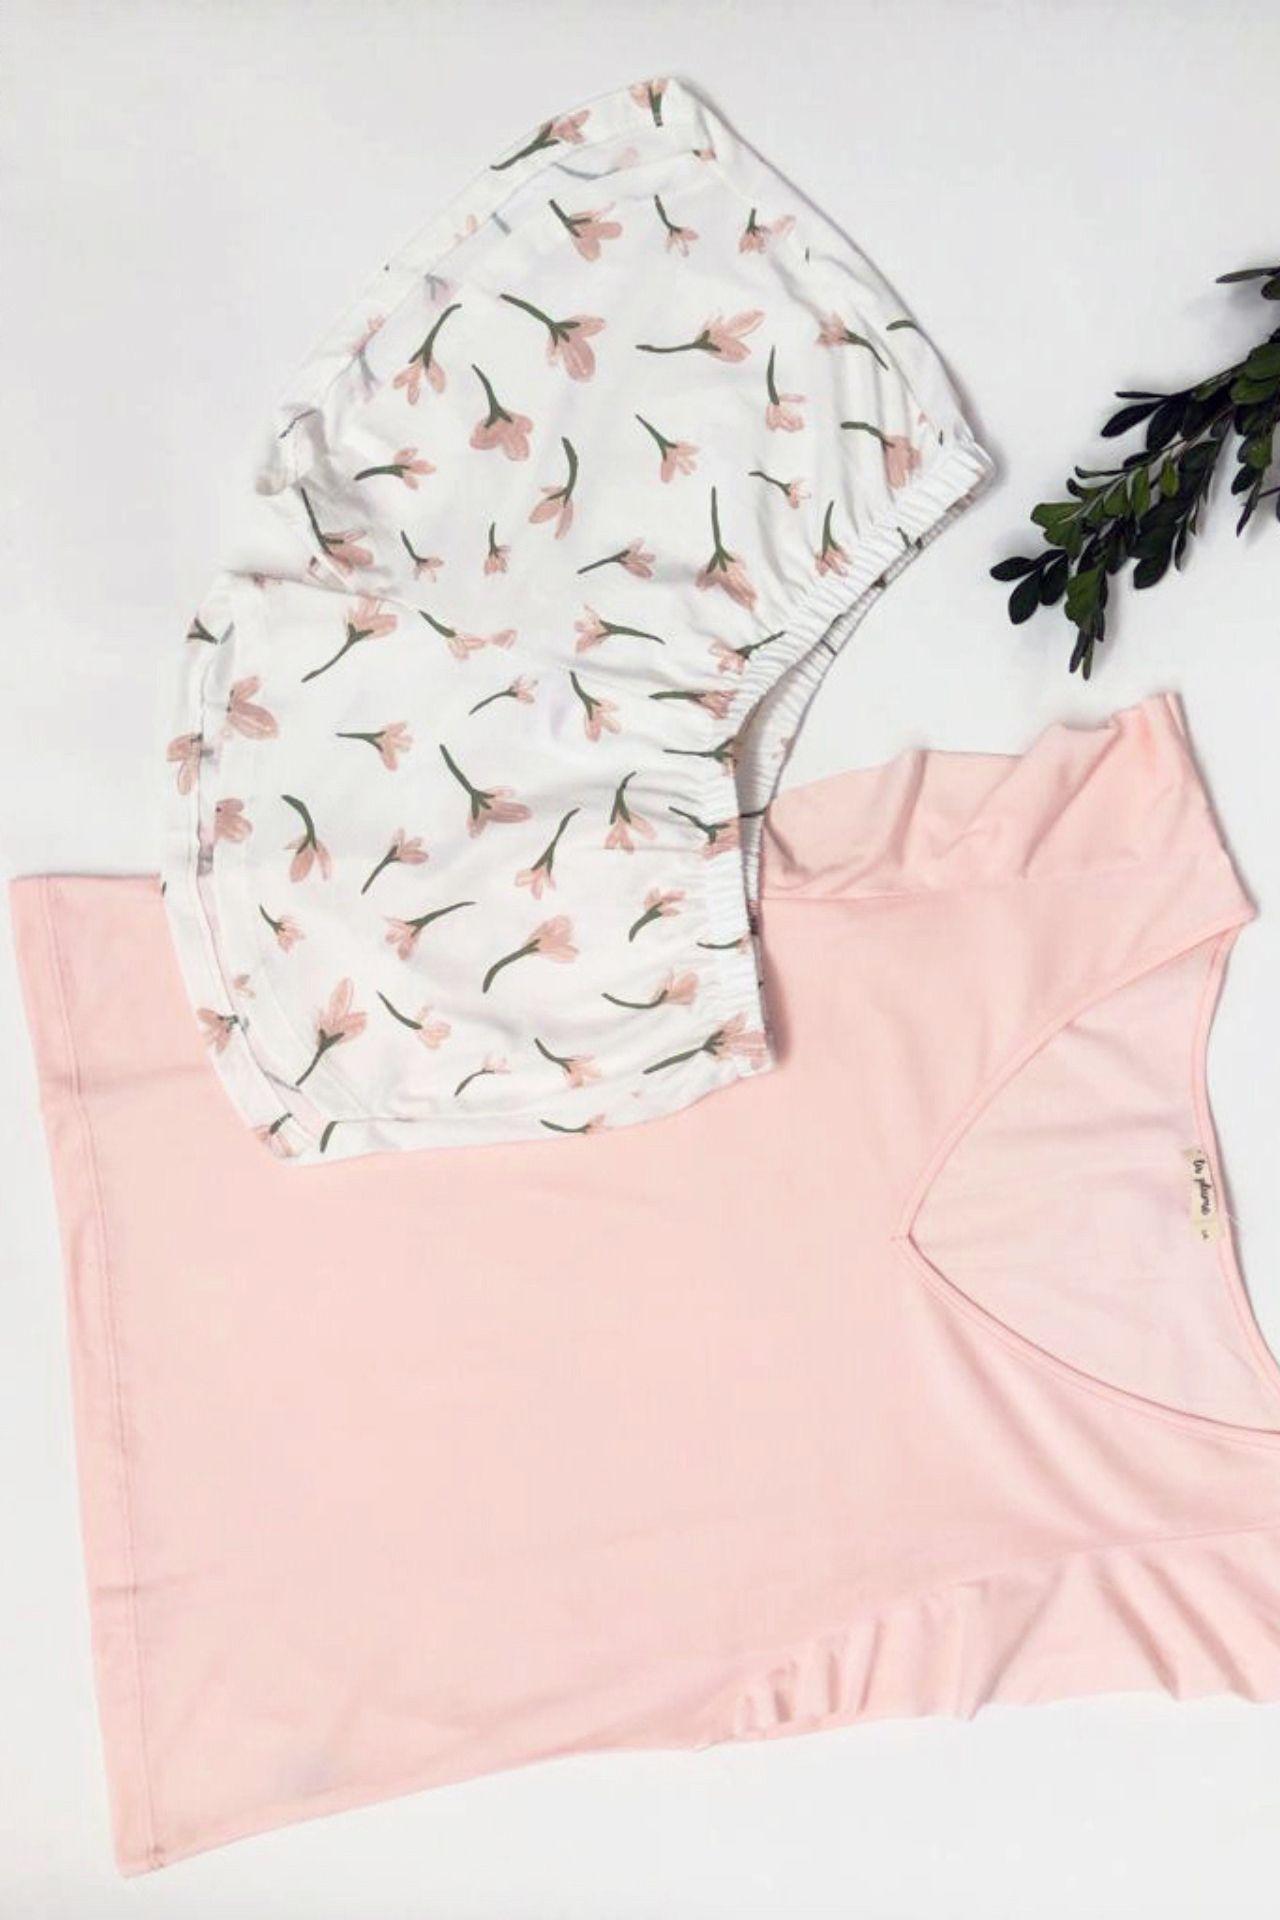 Pijama de dos piezas.  Material: 100% algodón pima.